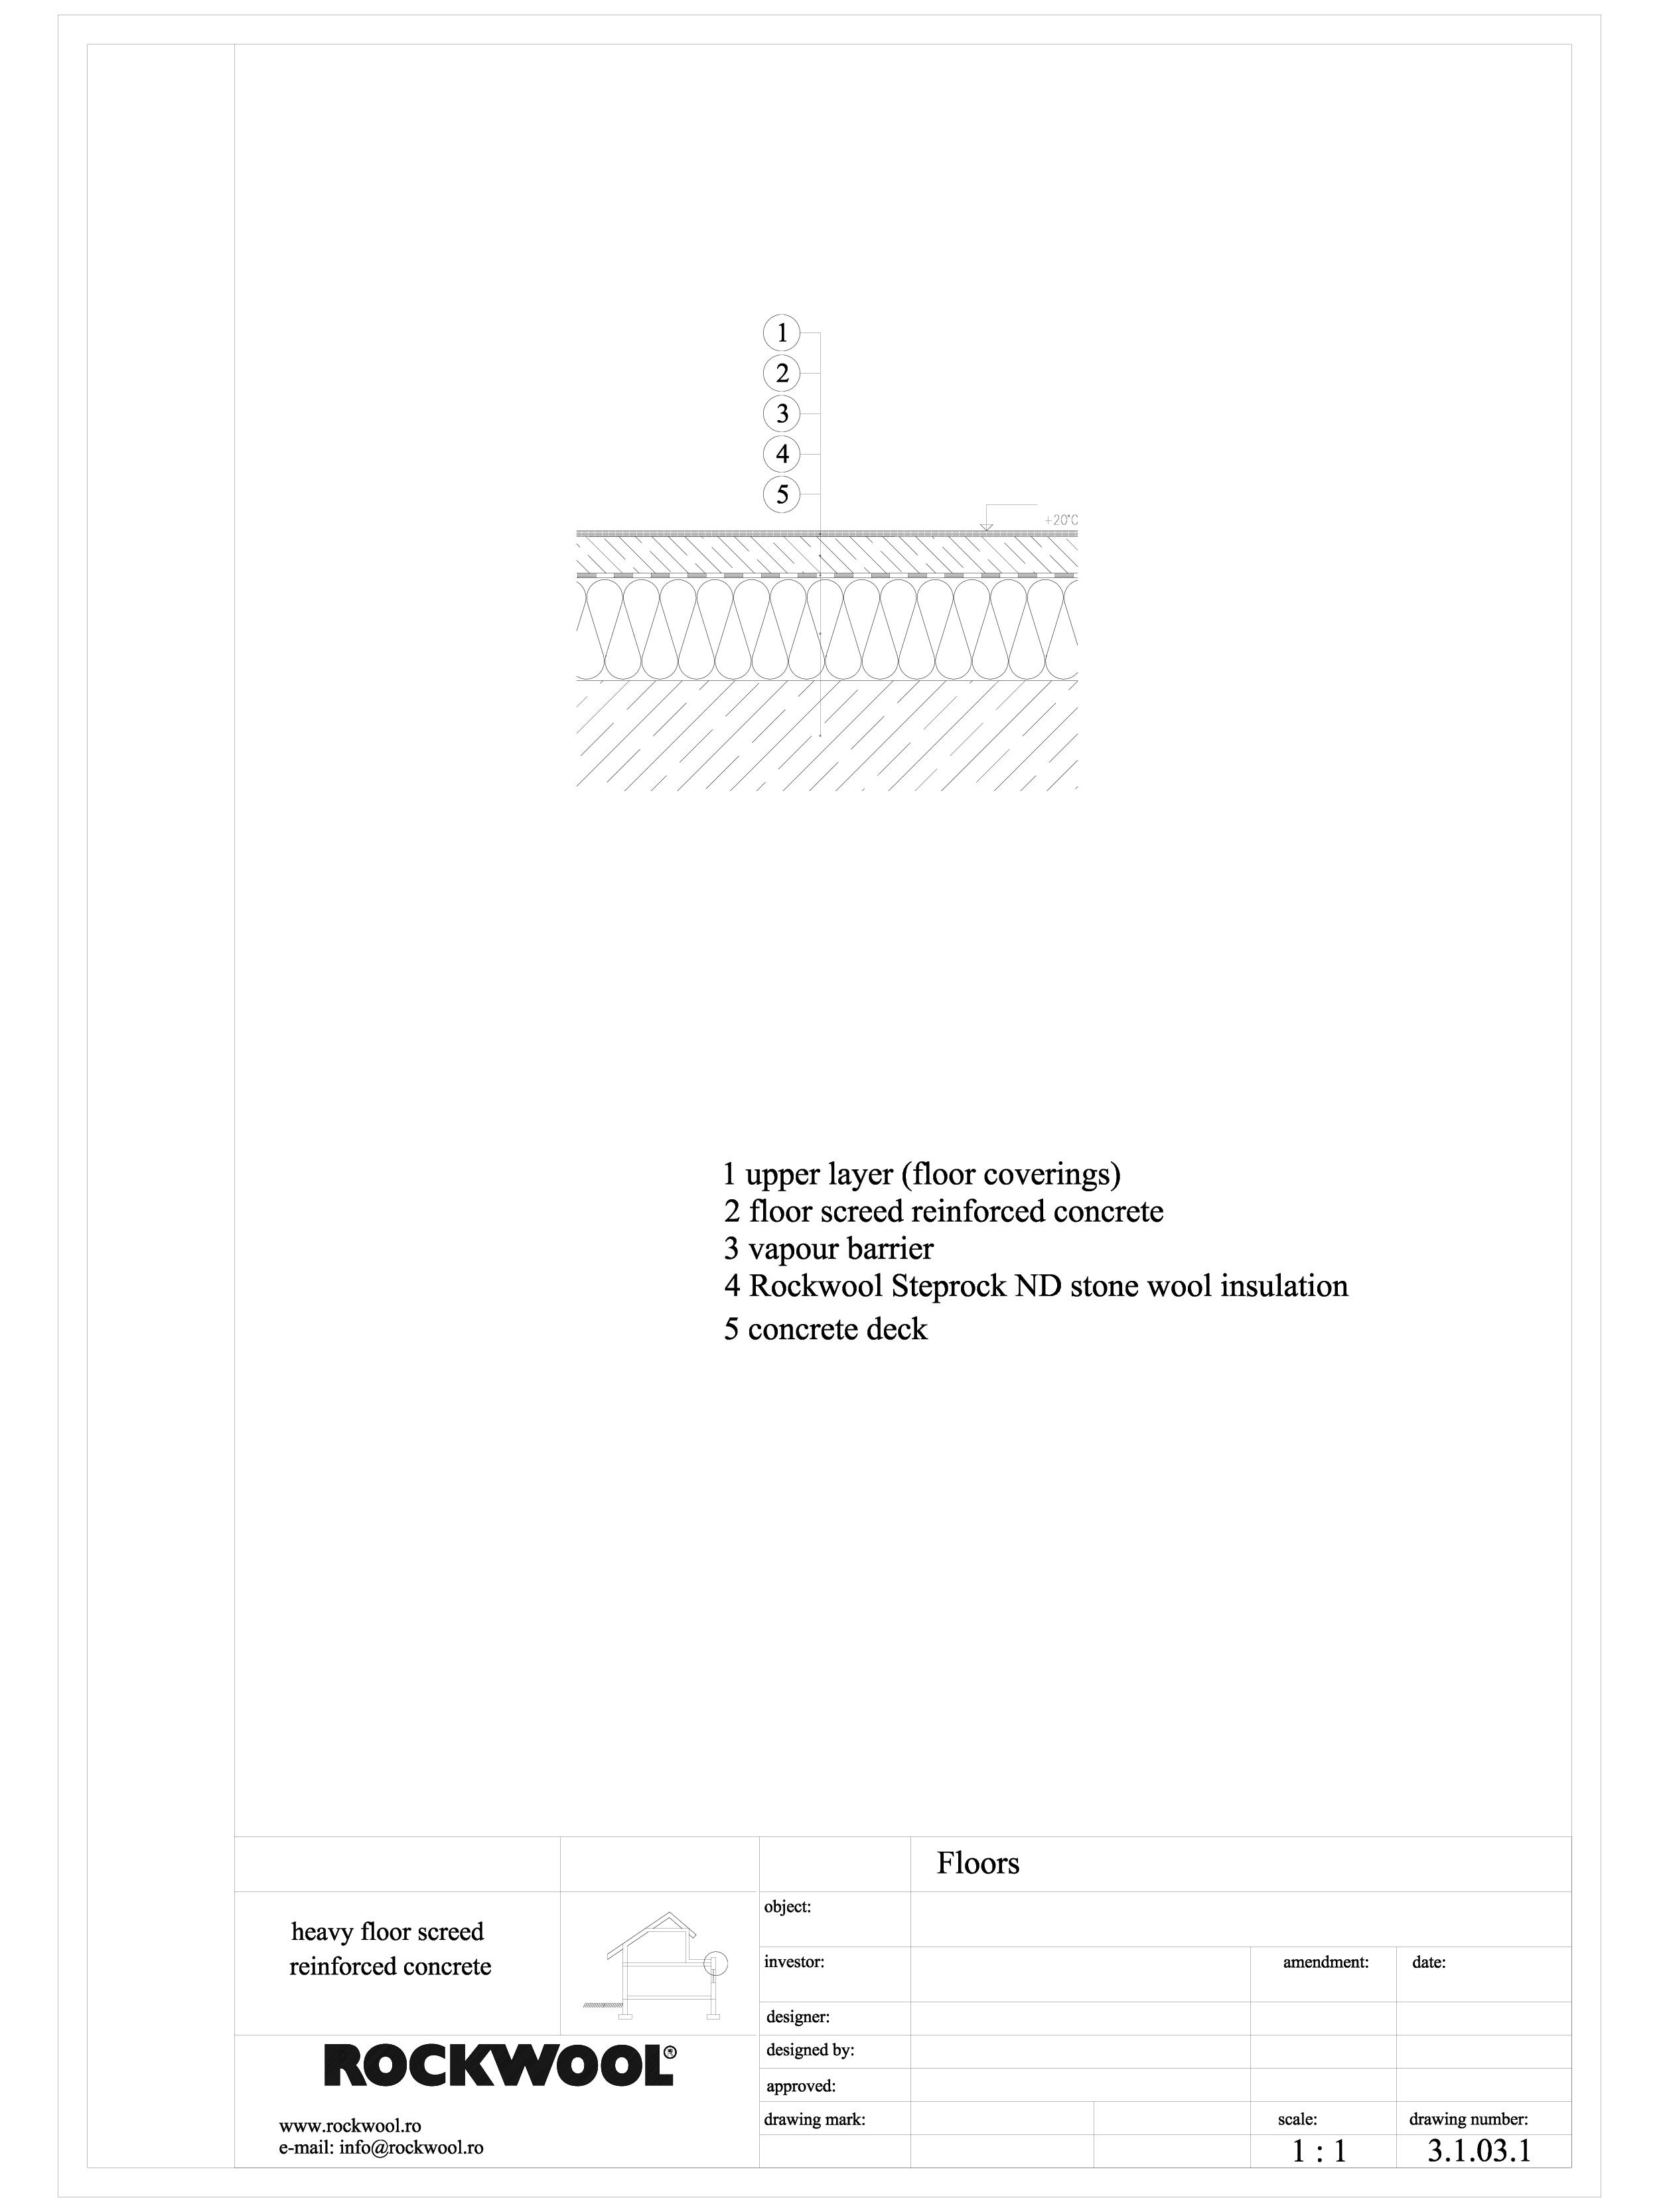 Termoizolarea pardoselilor - detaliu termoizolare pardoseala pe structura beton armat ROCKWOOL Termoizolatie vata bazaltica pentru pardoseli ROCKWOOL ROMANIA  - Pagina 1